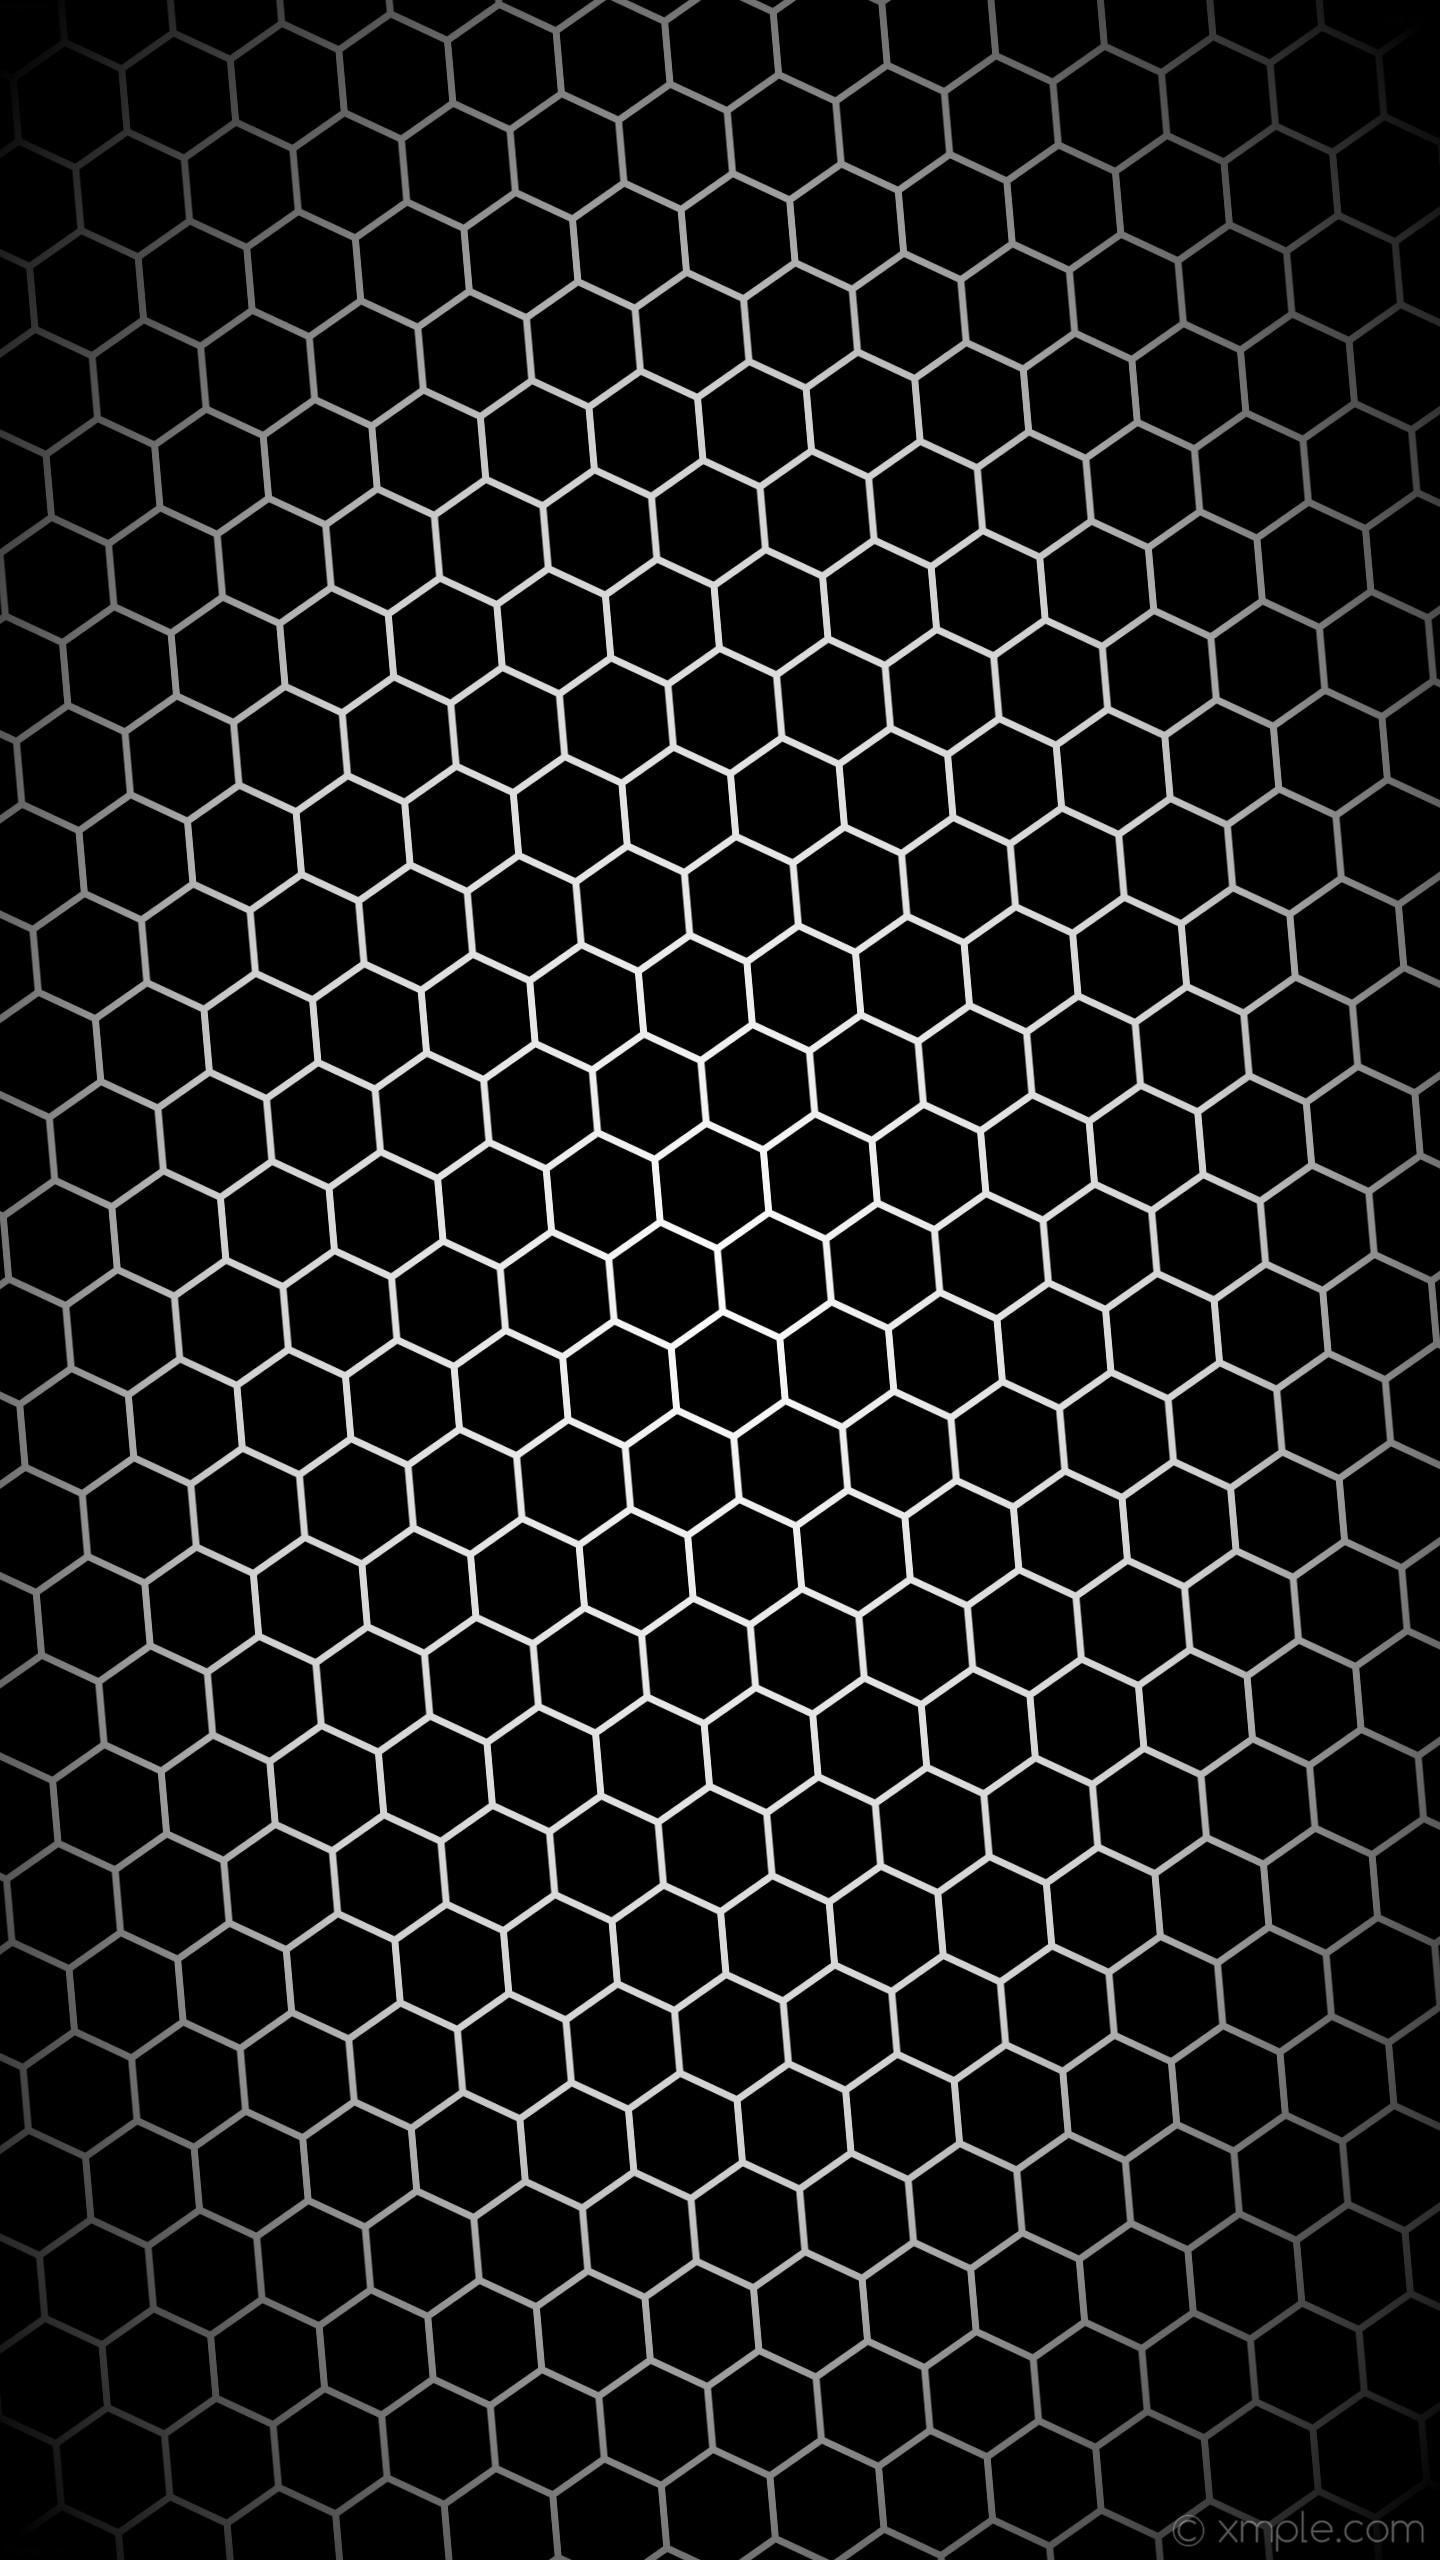 Black Hexagon Wallpaper 84 Images